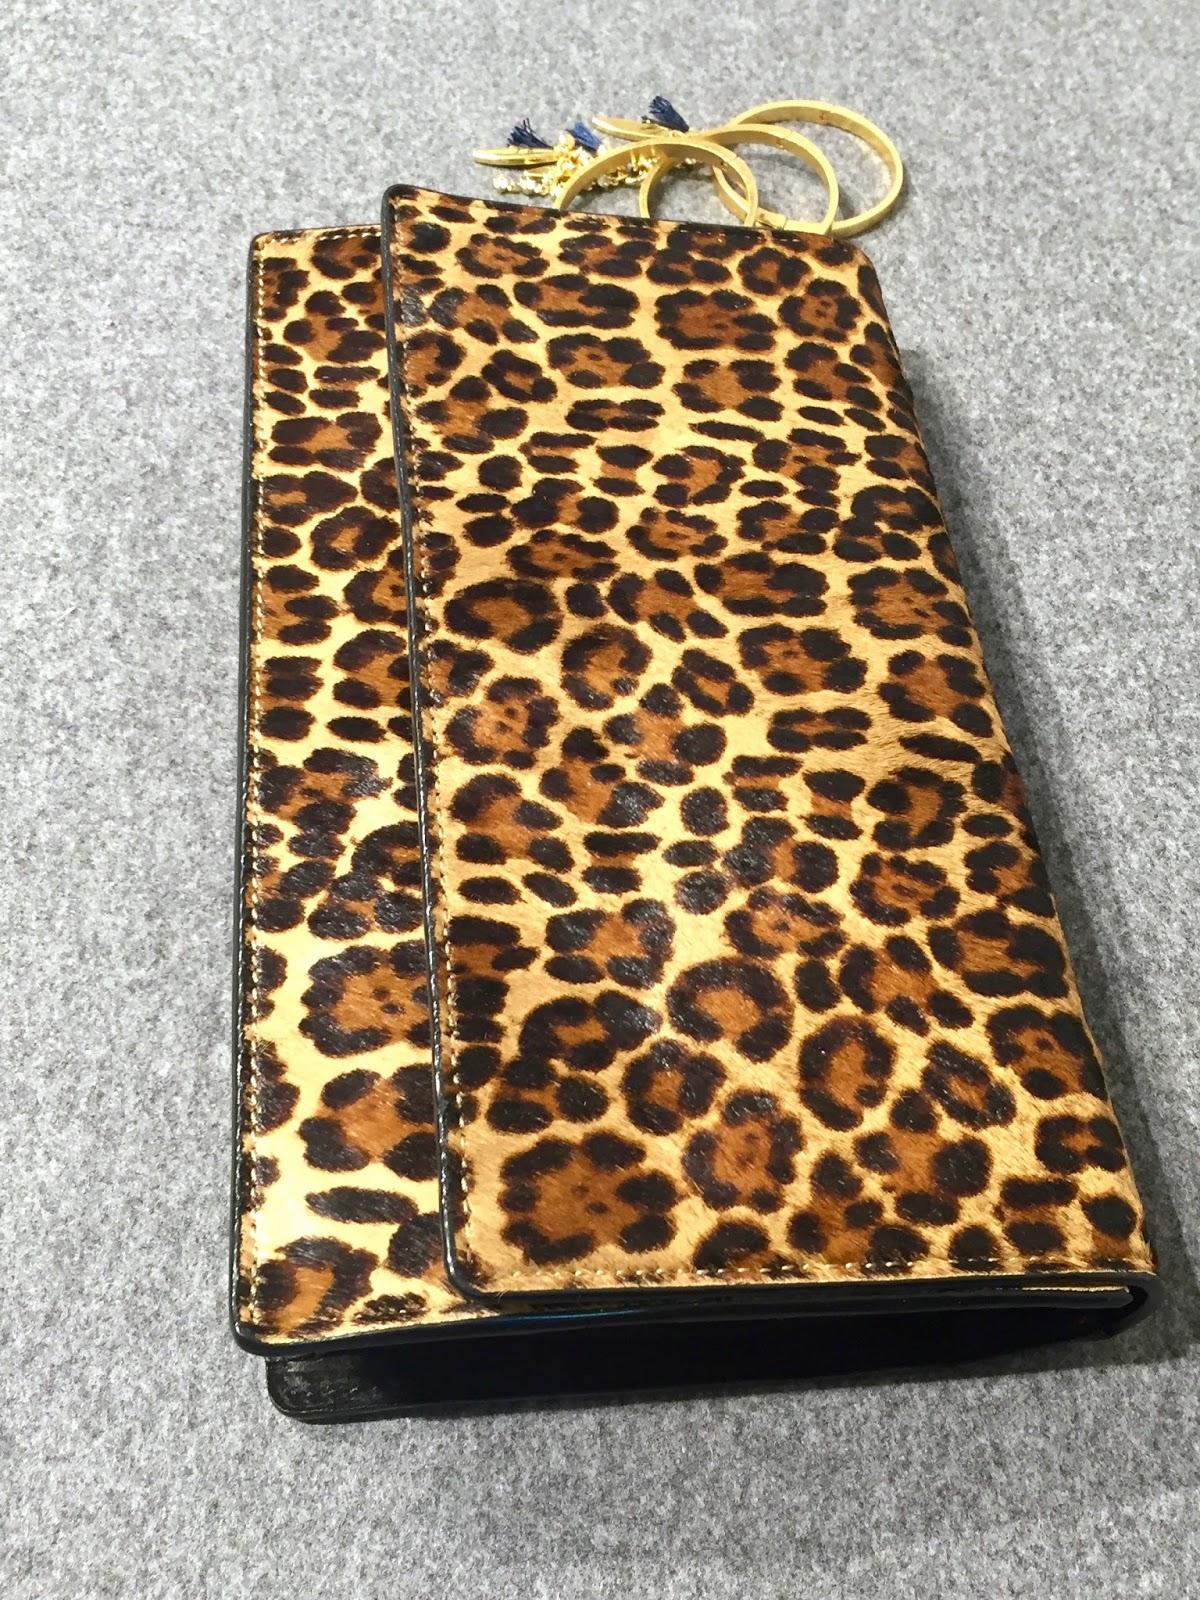 ann taylor leopard clutch